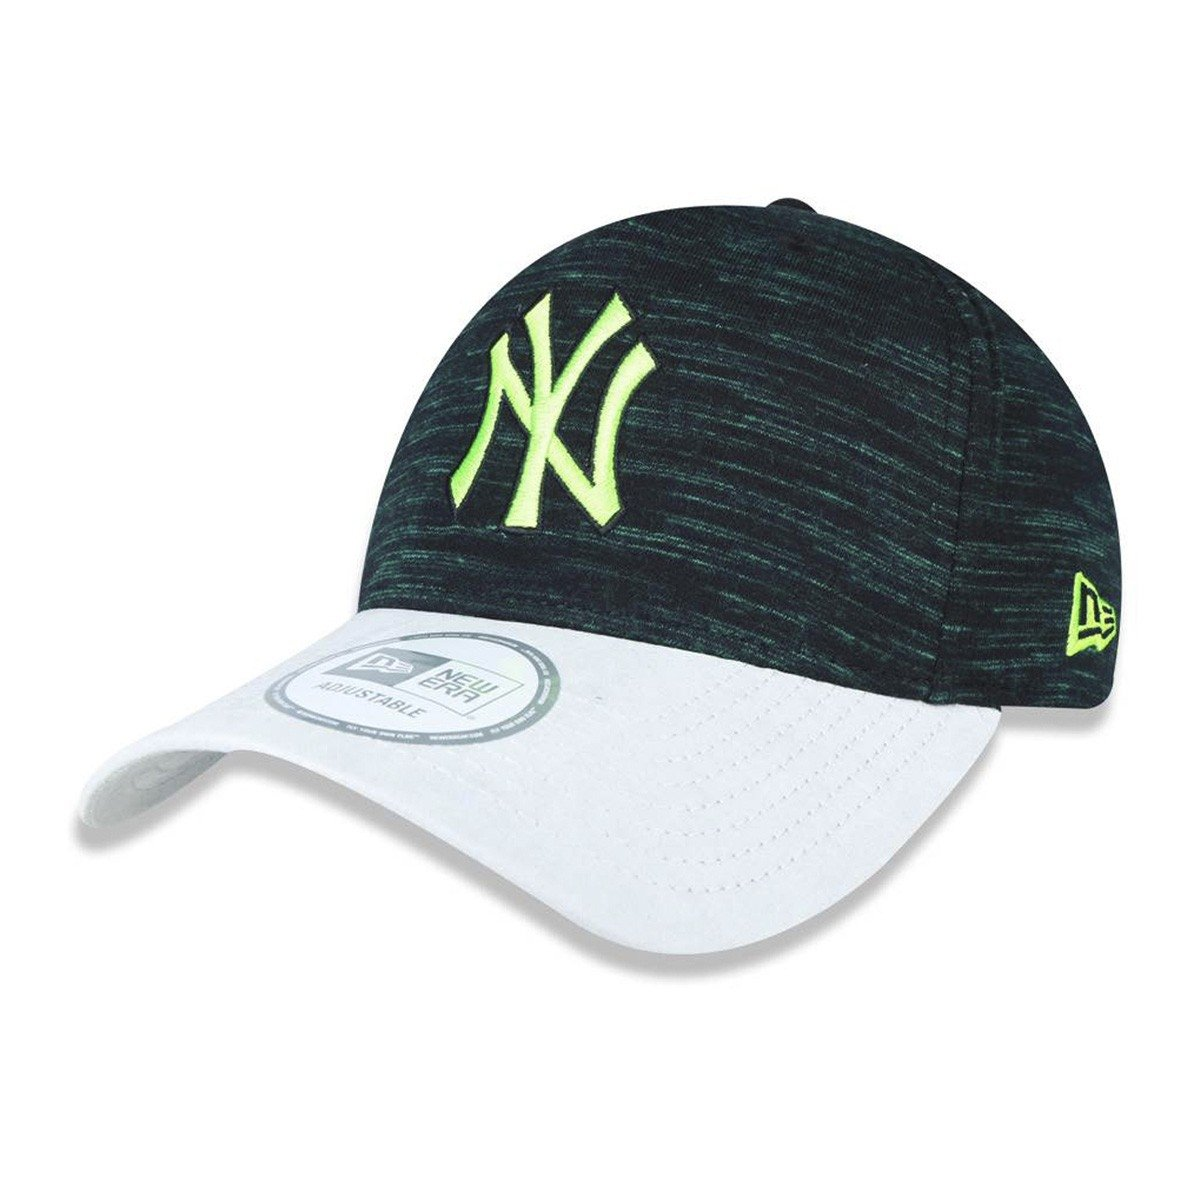 798787c33 Bone New Era 940 New York Yankees - Compre Agora